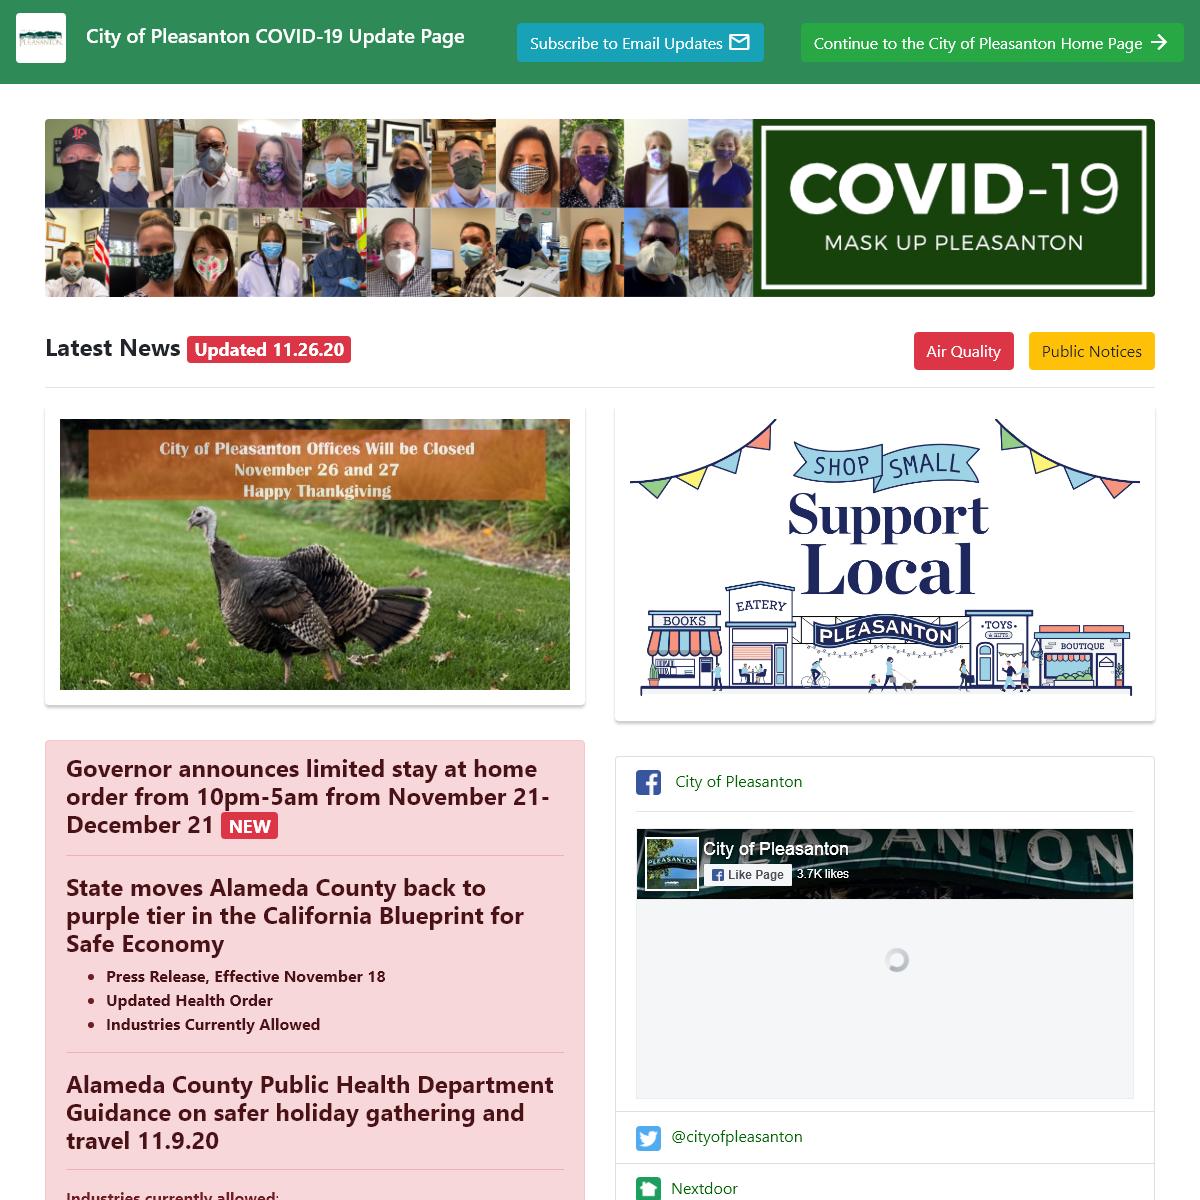 City of Pleasanton COVID-19 Updates